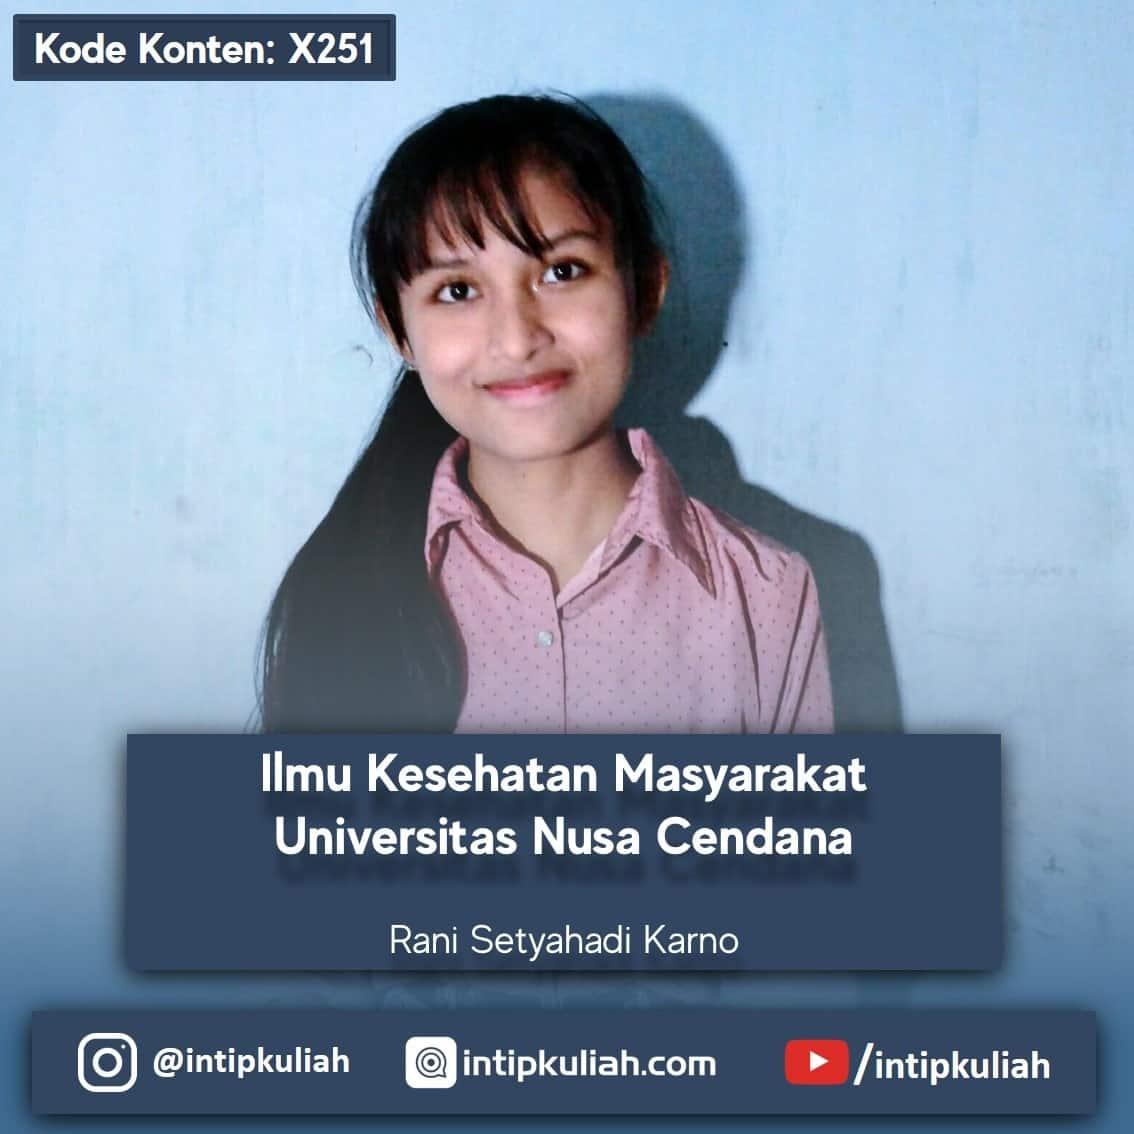 Kesehatan Masyarakat Undana / Universitas Nusa Cendana (Rani)